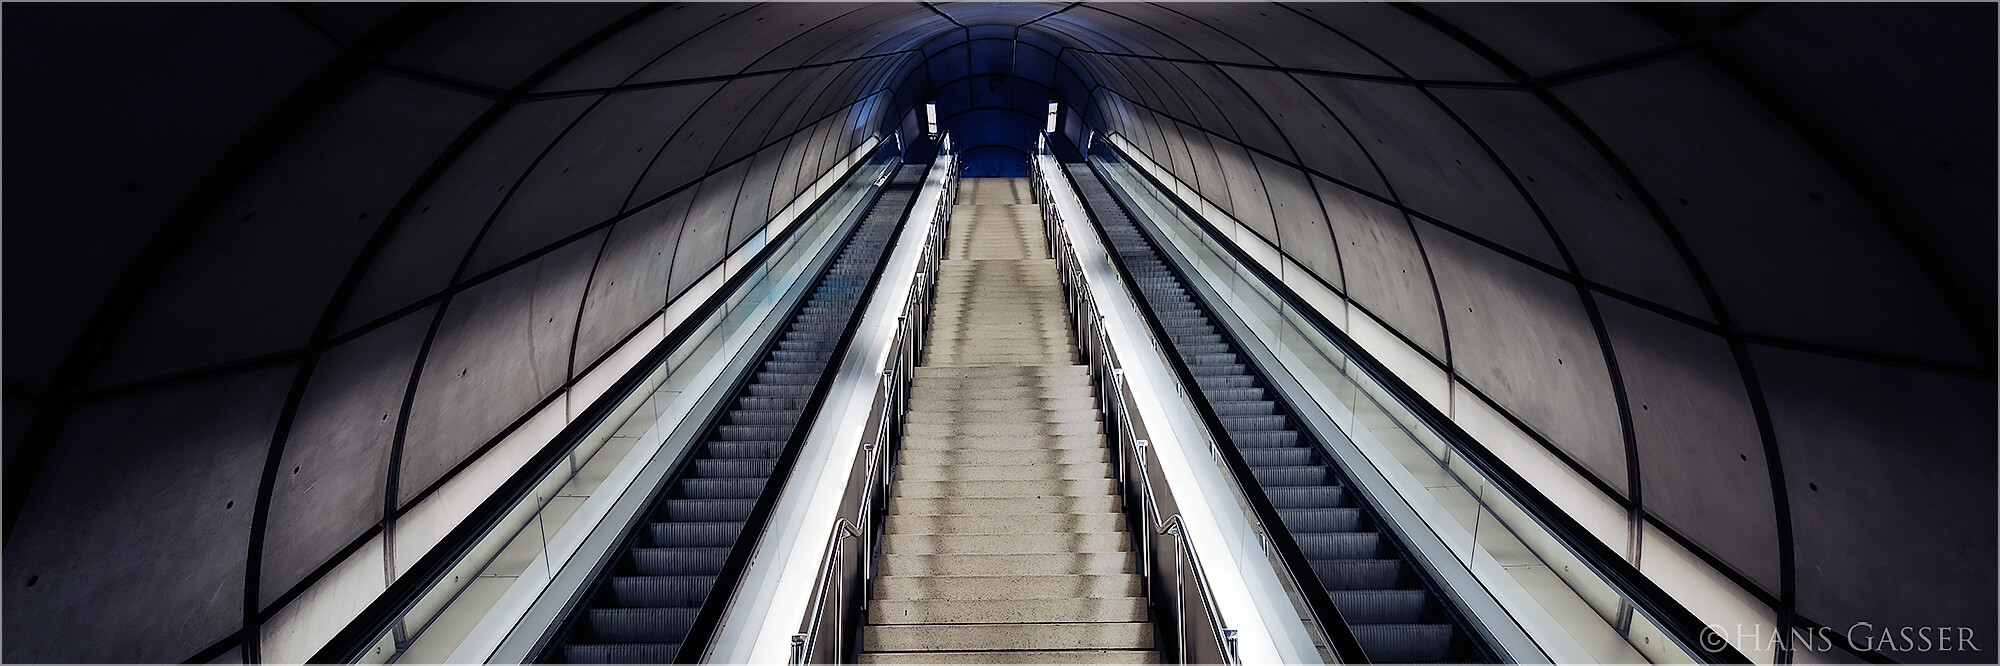 Panoramafoto Metro von Bilbao Spanien